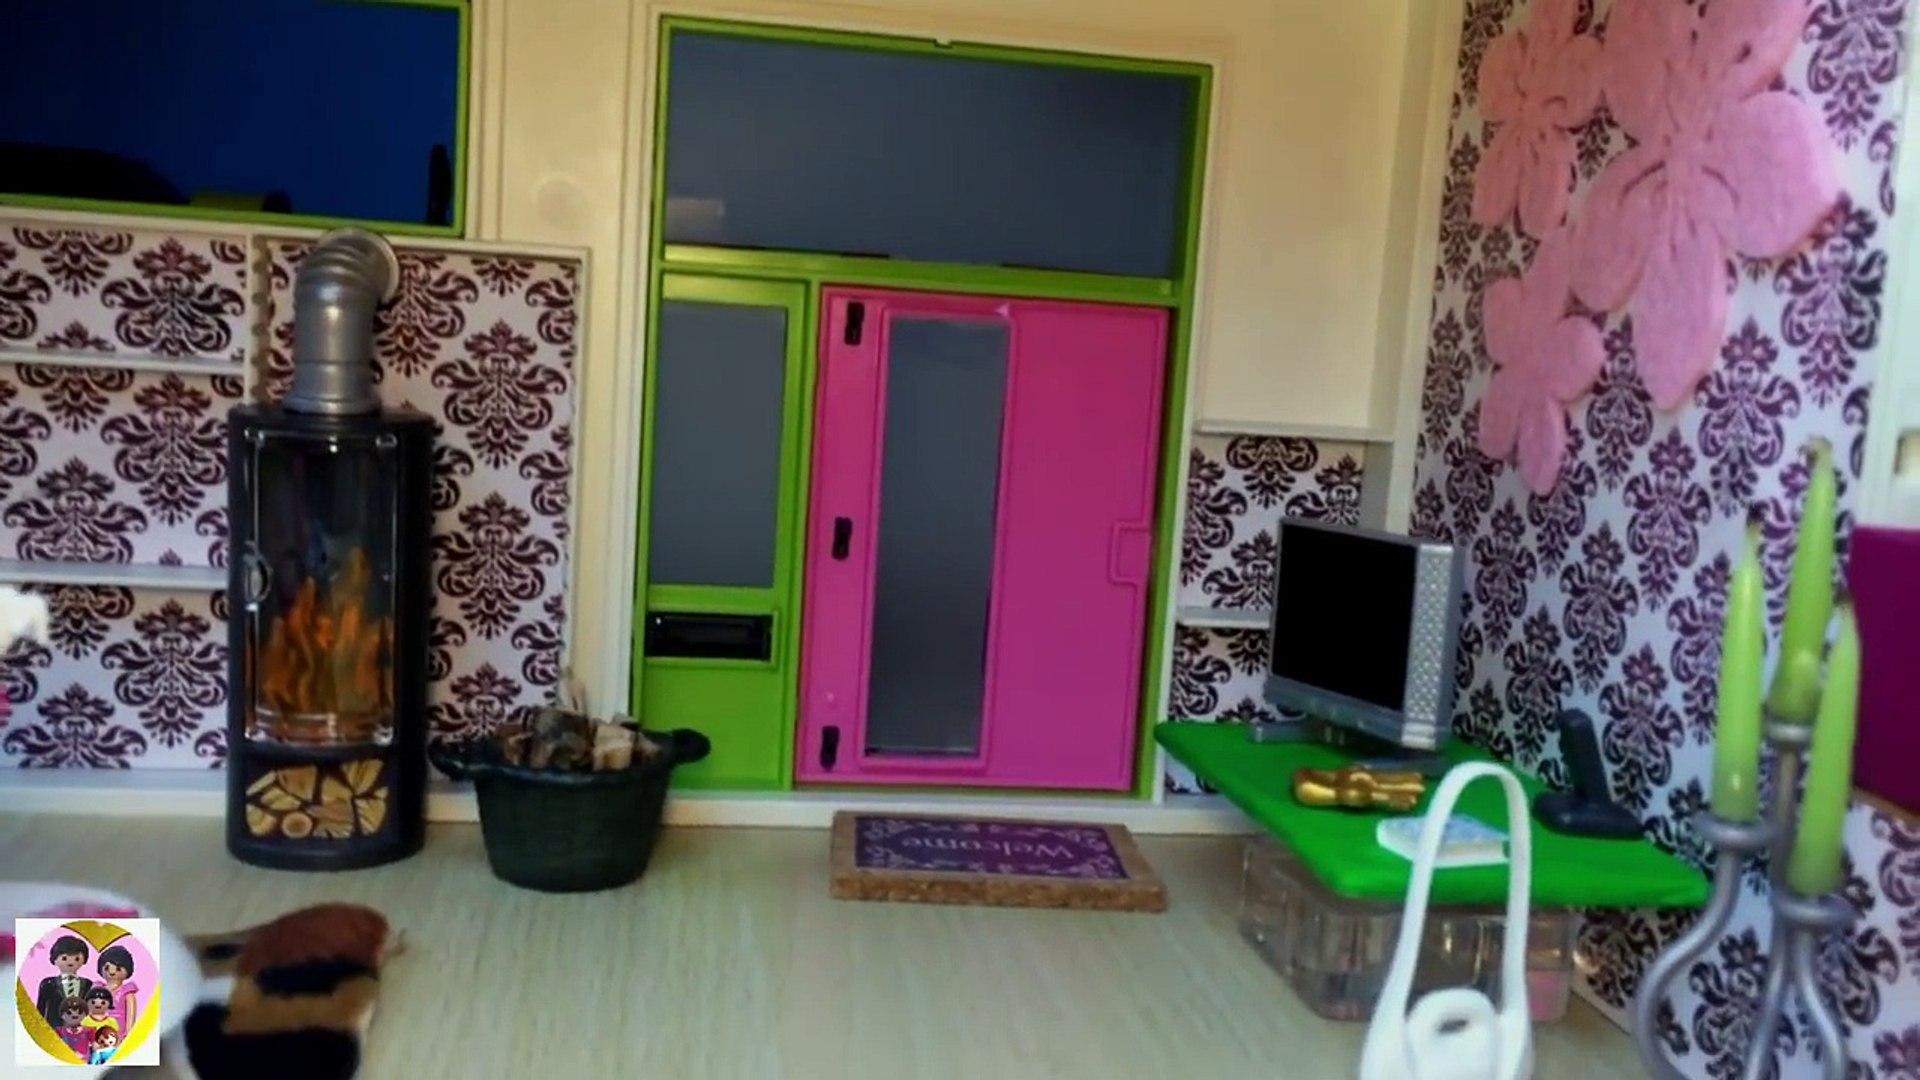 Playmobil neues Wohnzimmer | Pimp my Playmobil